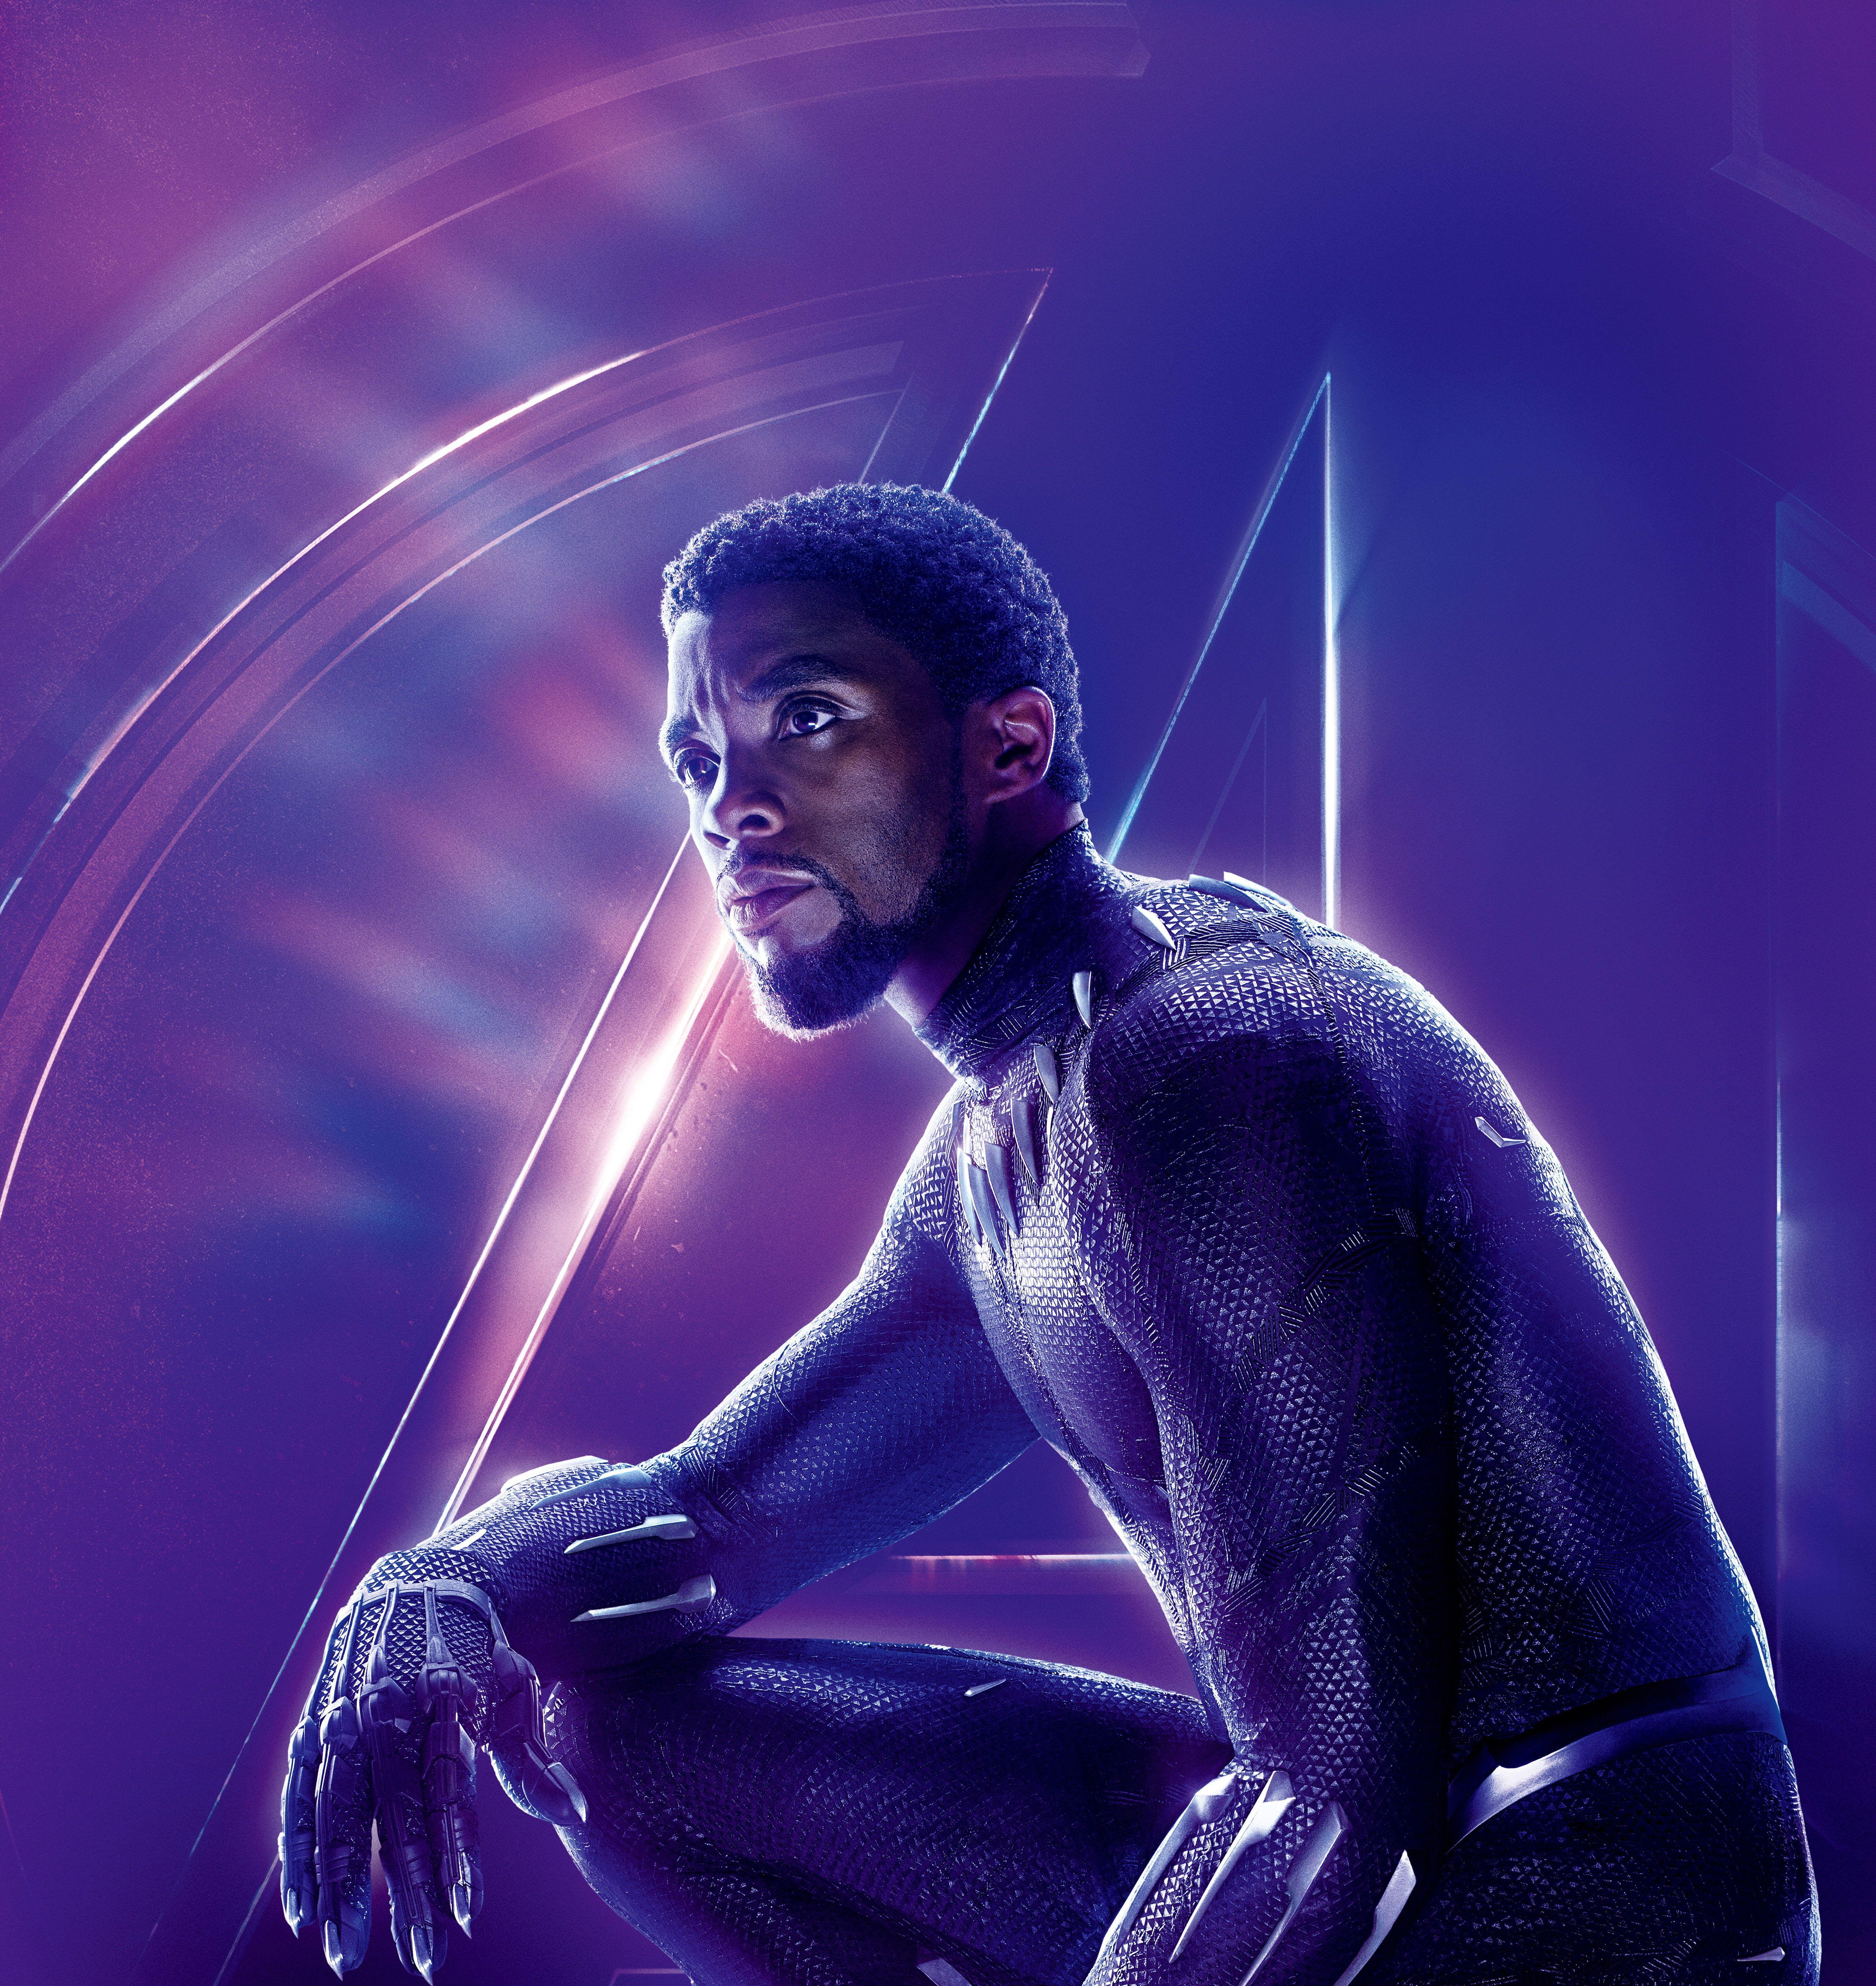 Chadwick Boseman Black Panther Wallpapers Wallpaper Cave